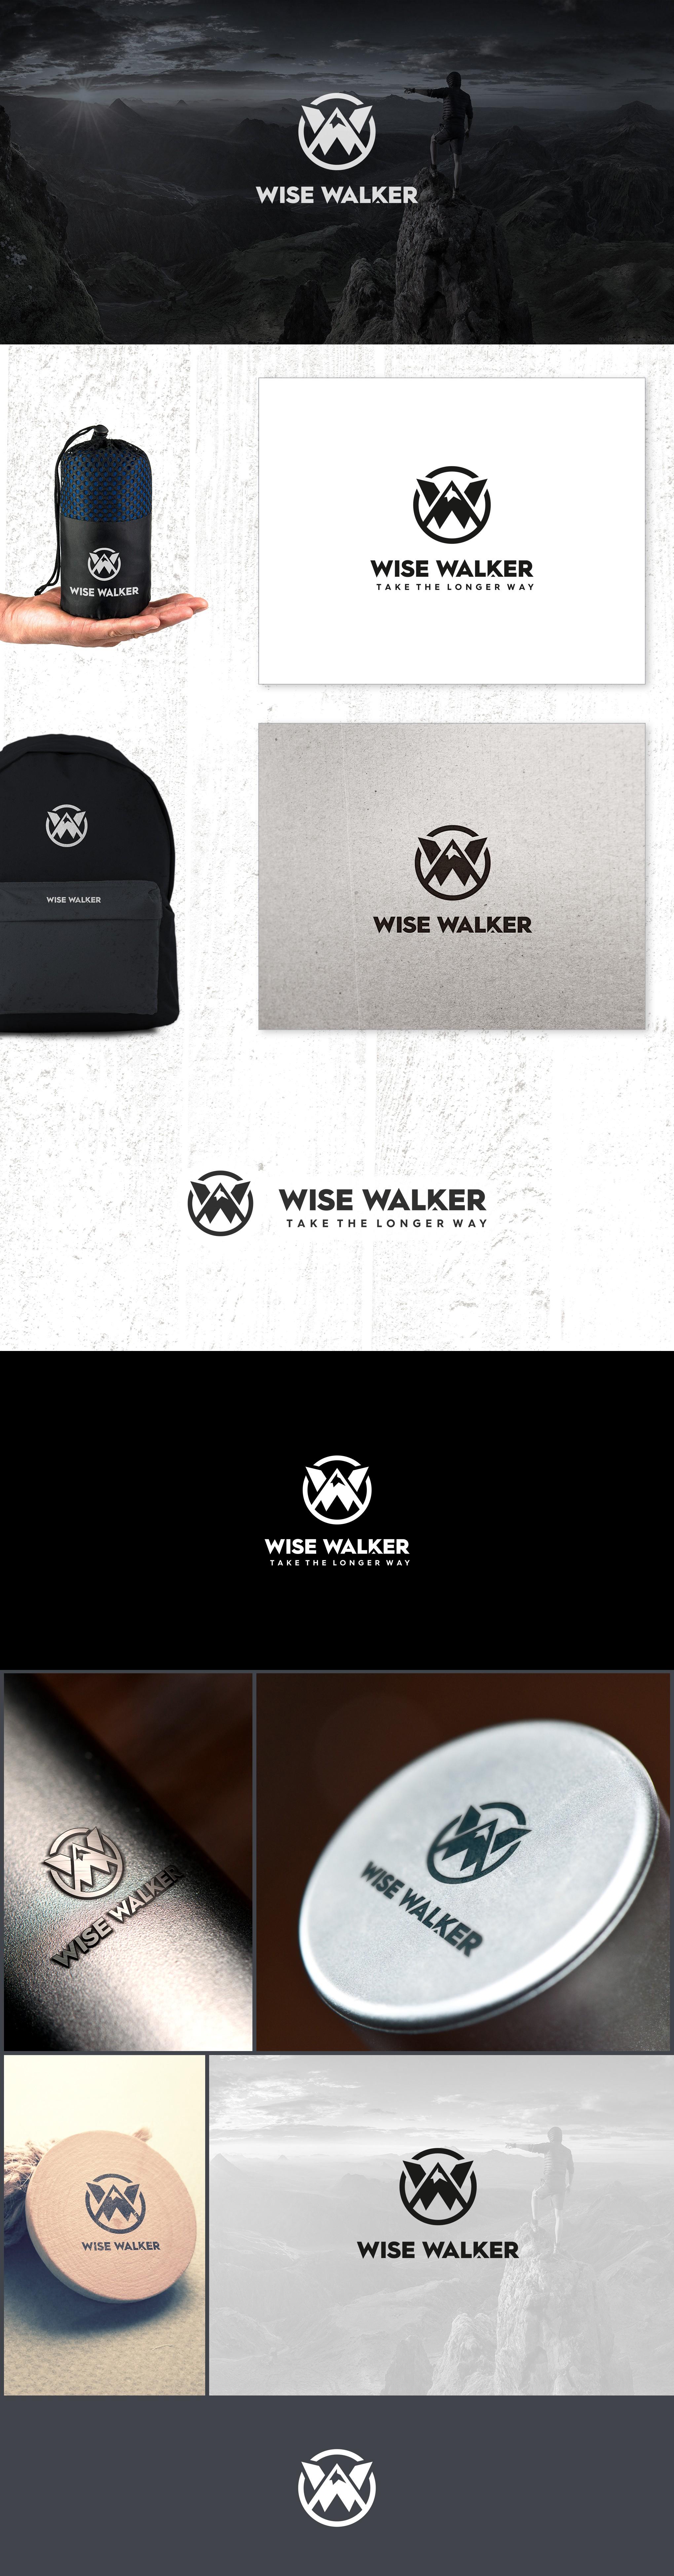 LOGO DESIGN: modern, simple & clean